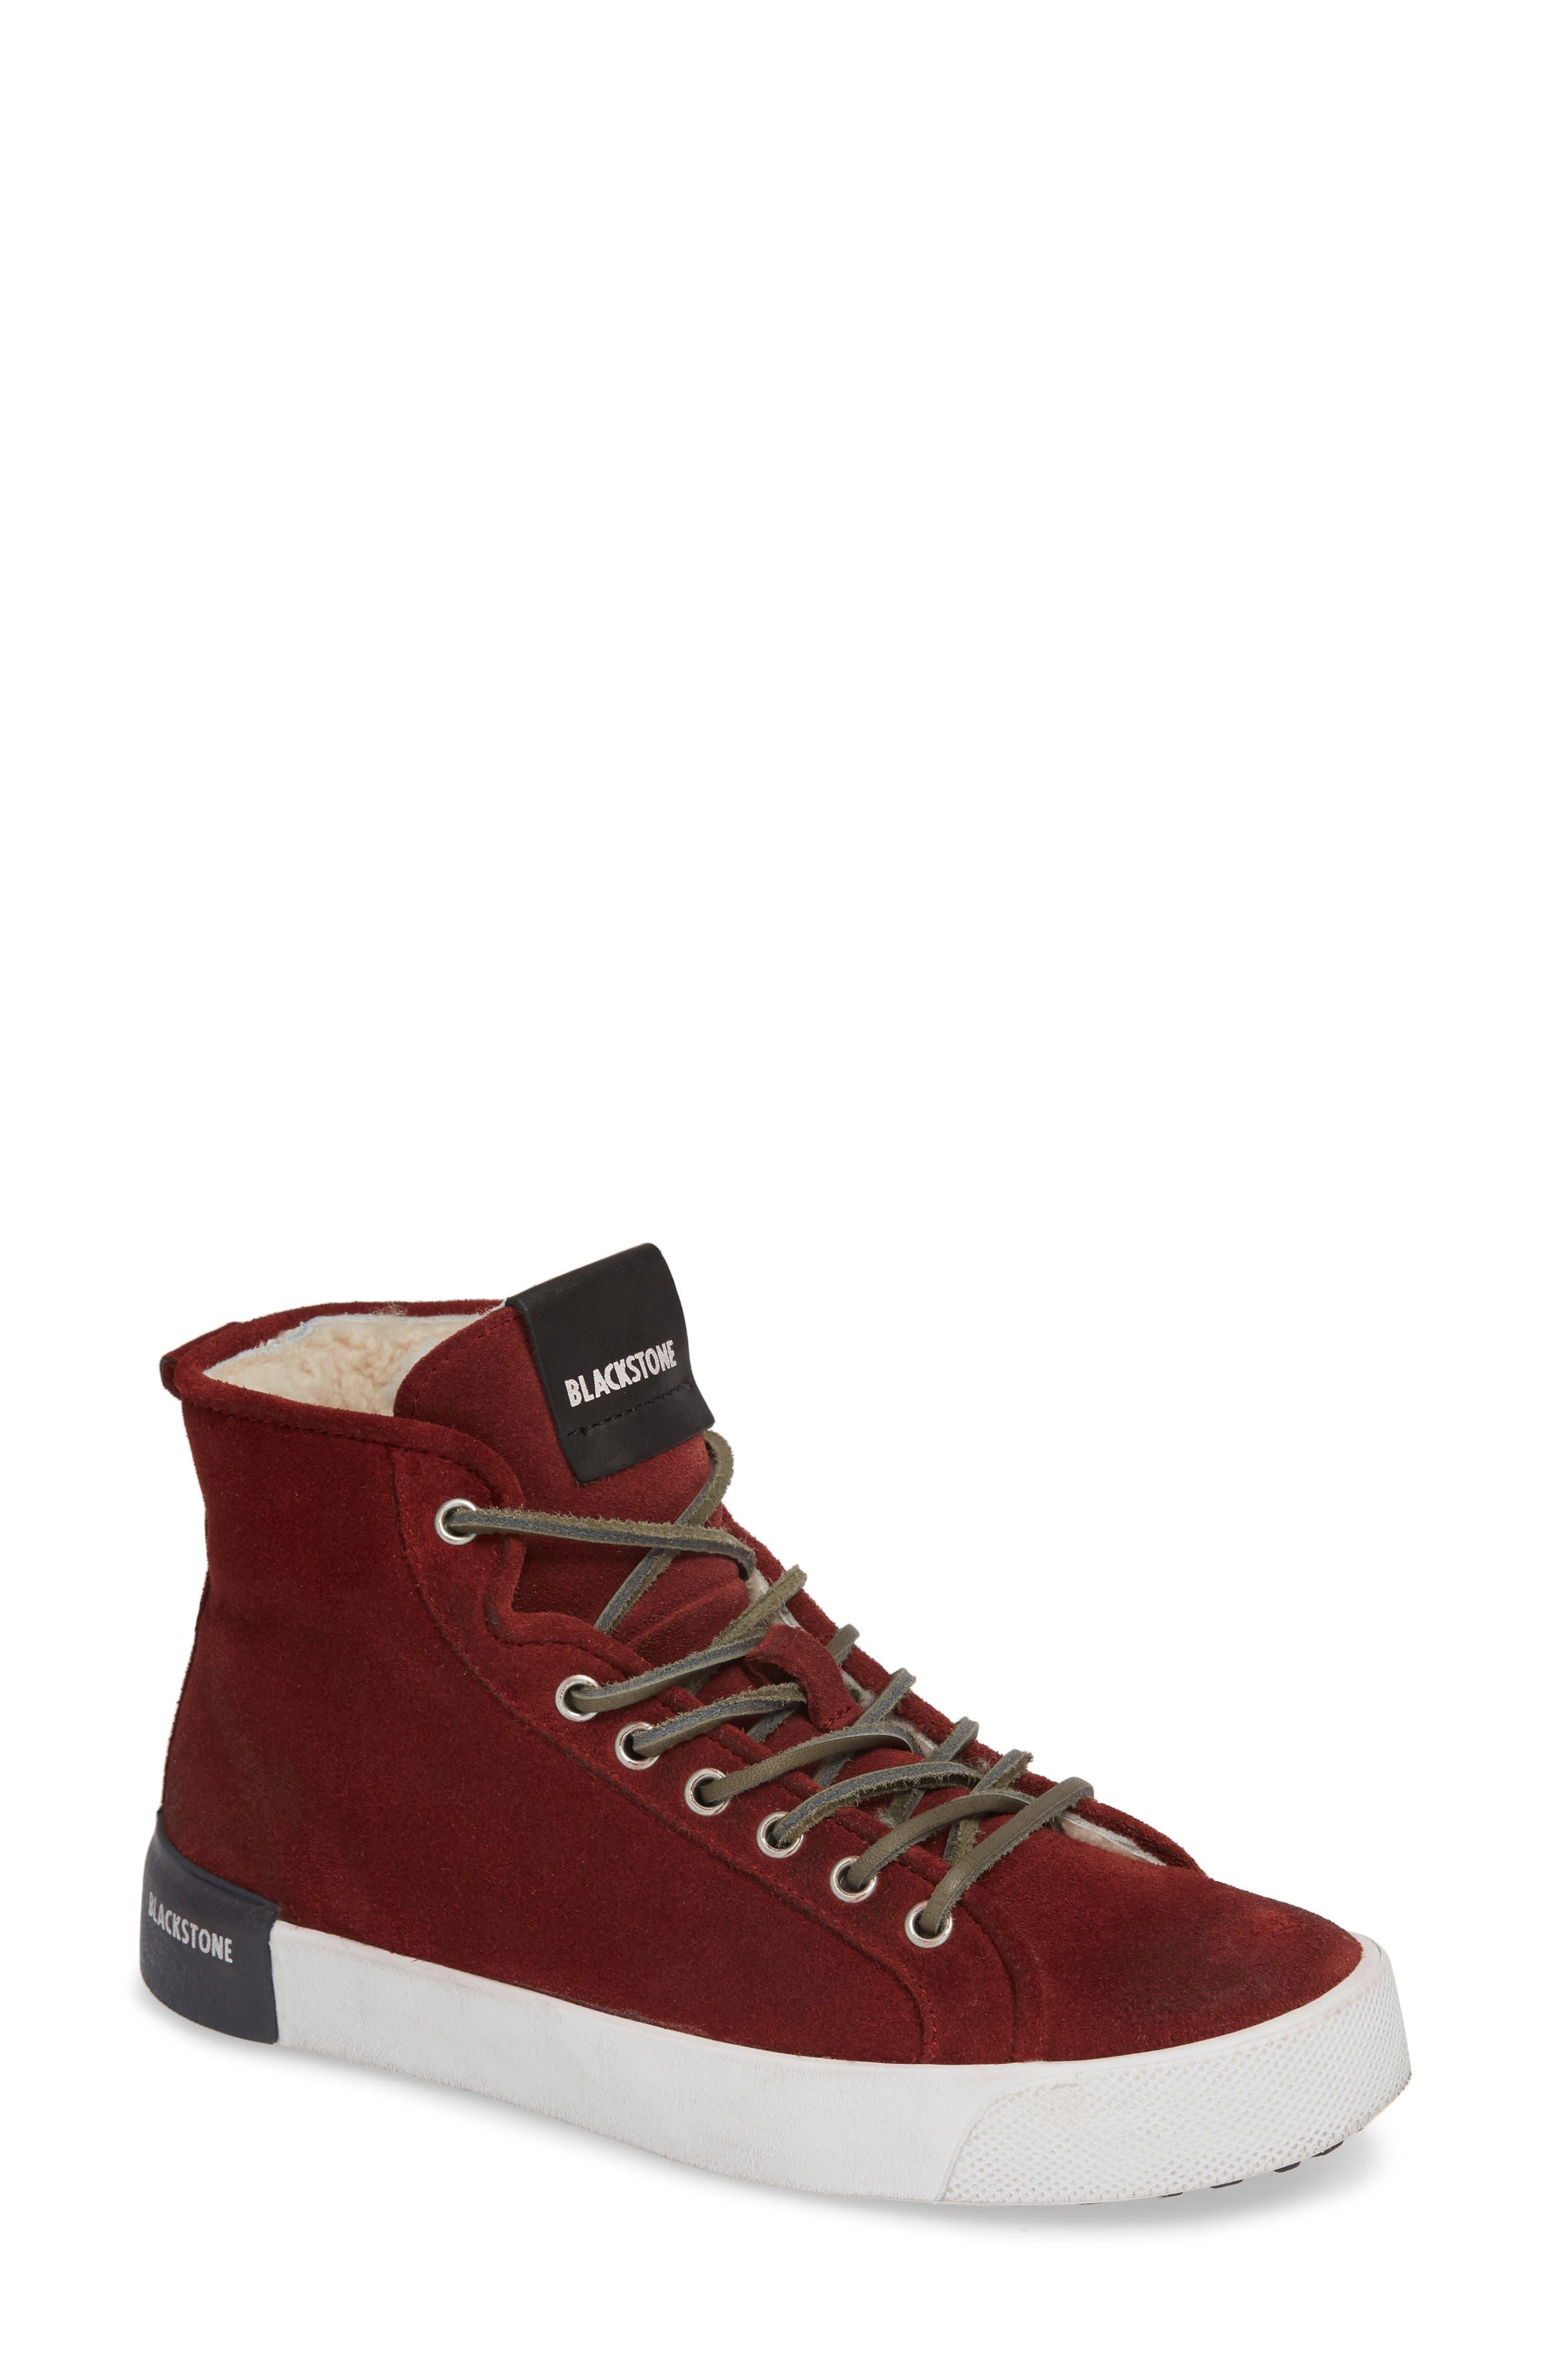 Ql70 Genuine Shearling Lined Sneaker